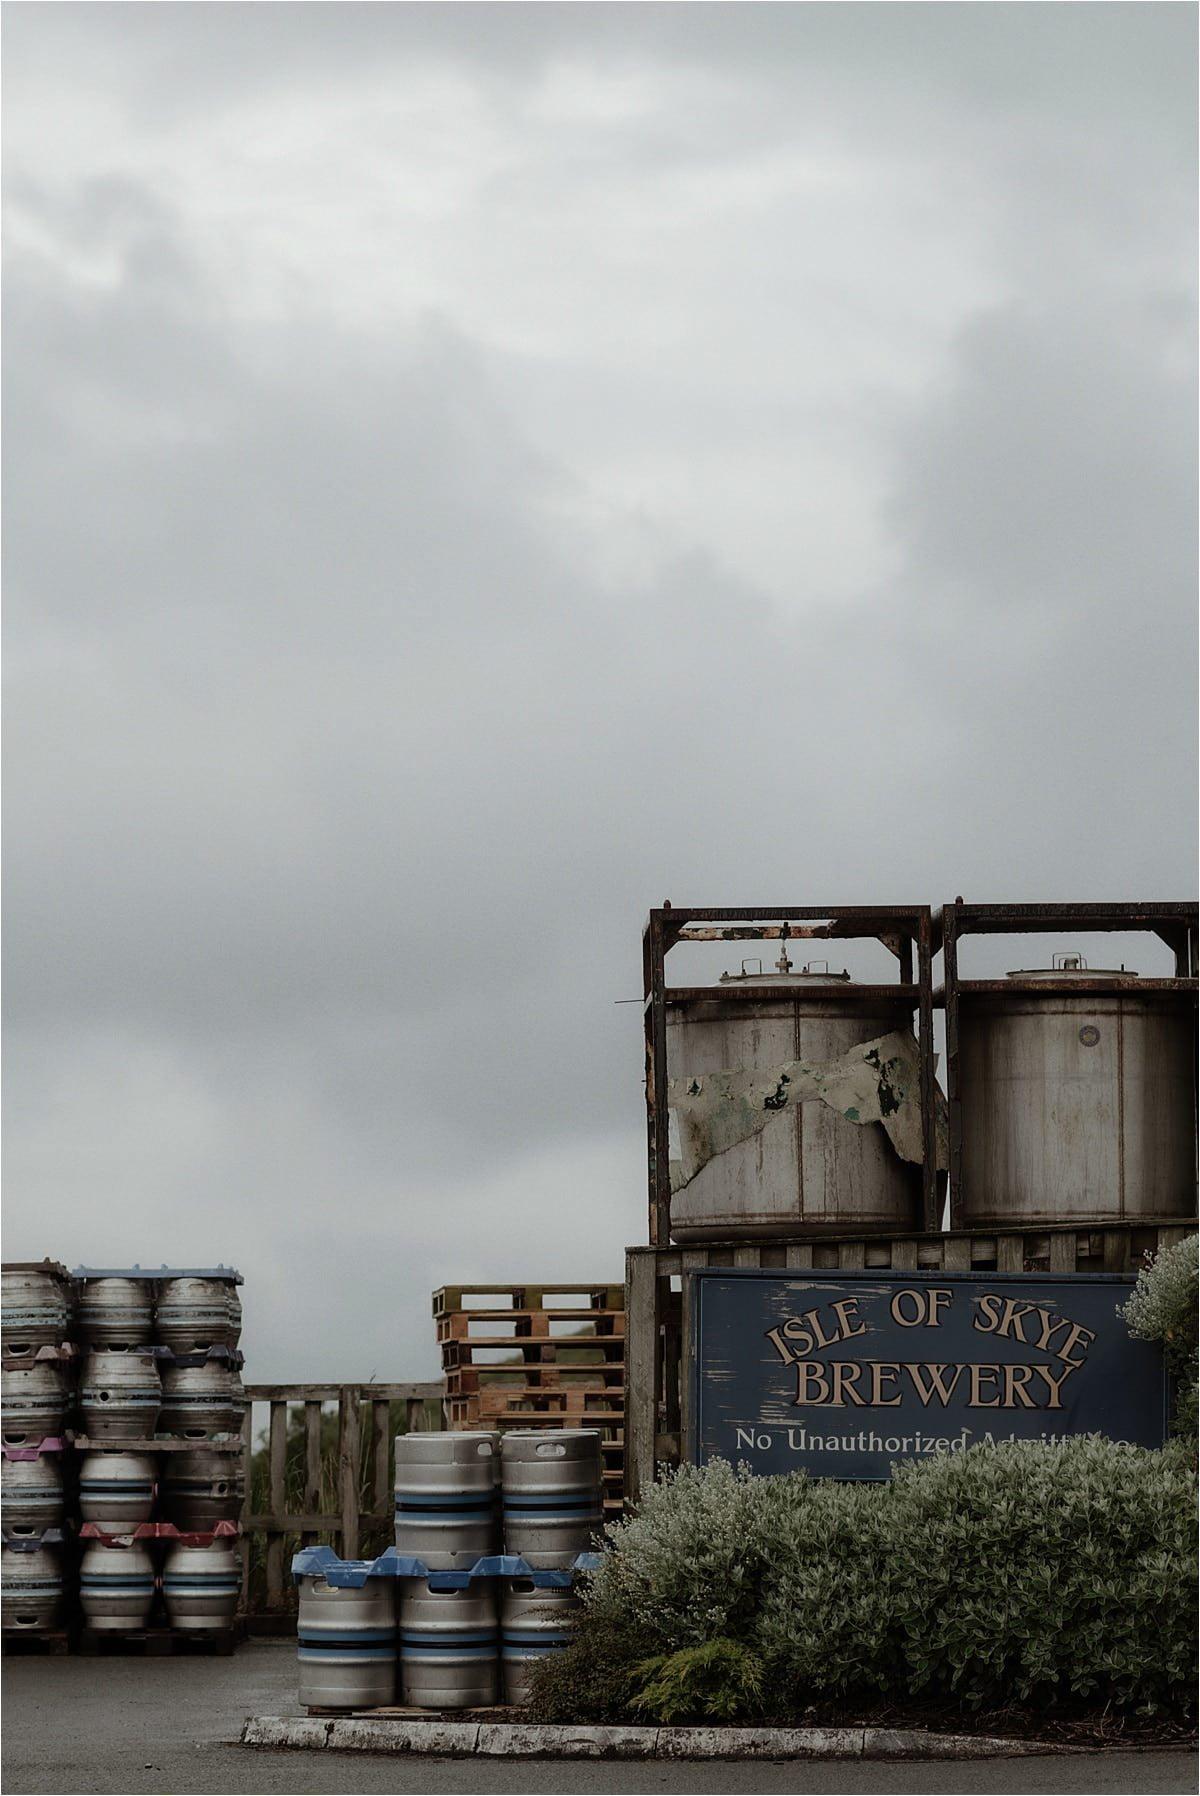 skye brewery on isle of skye